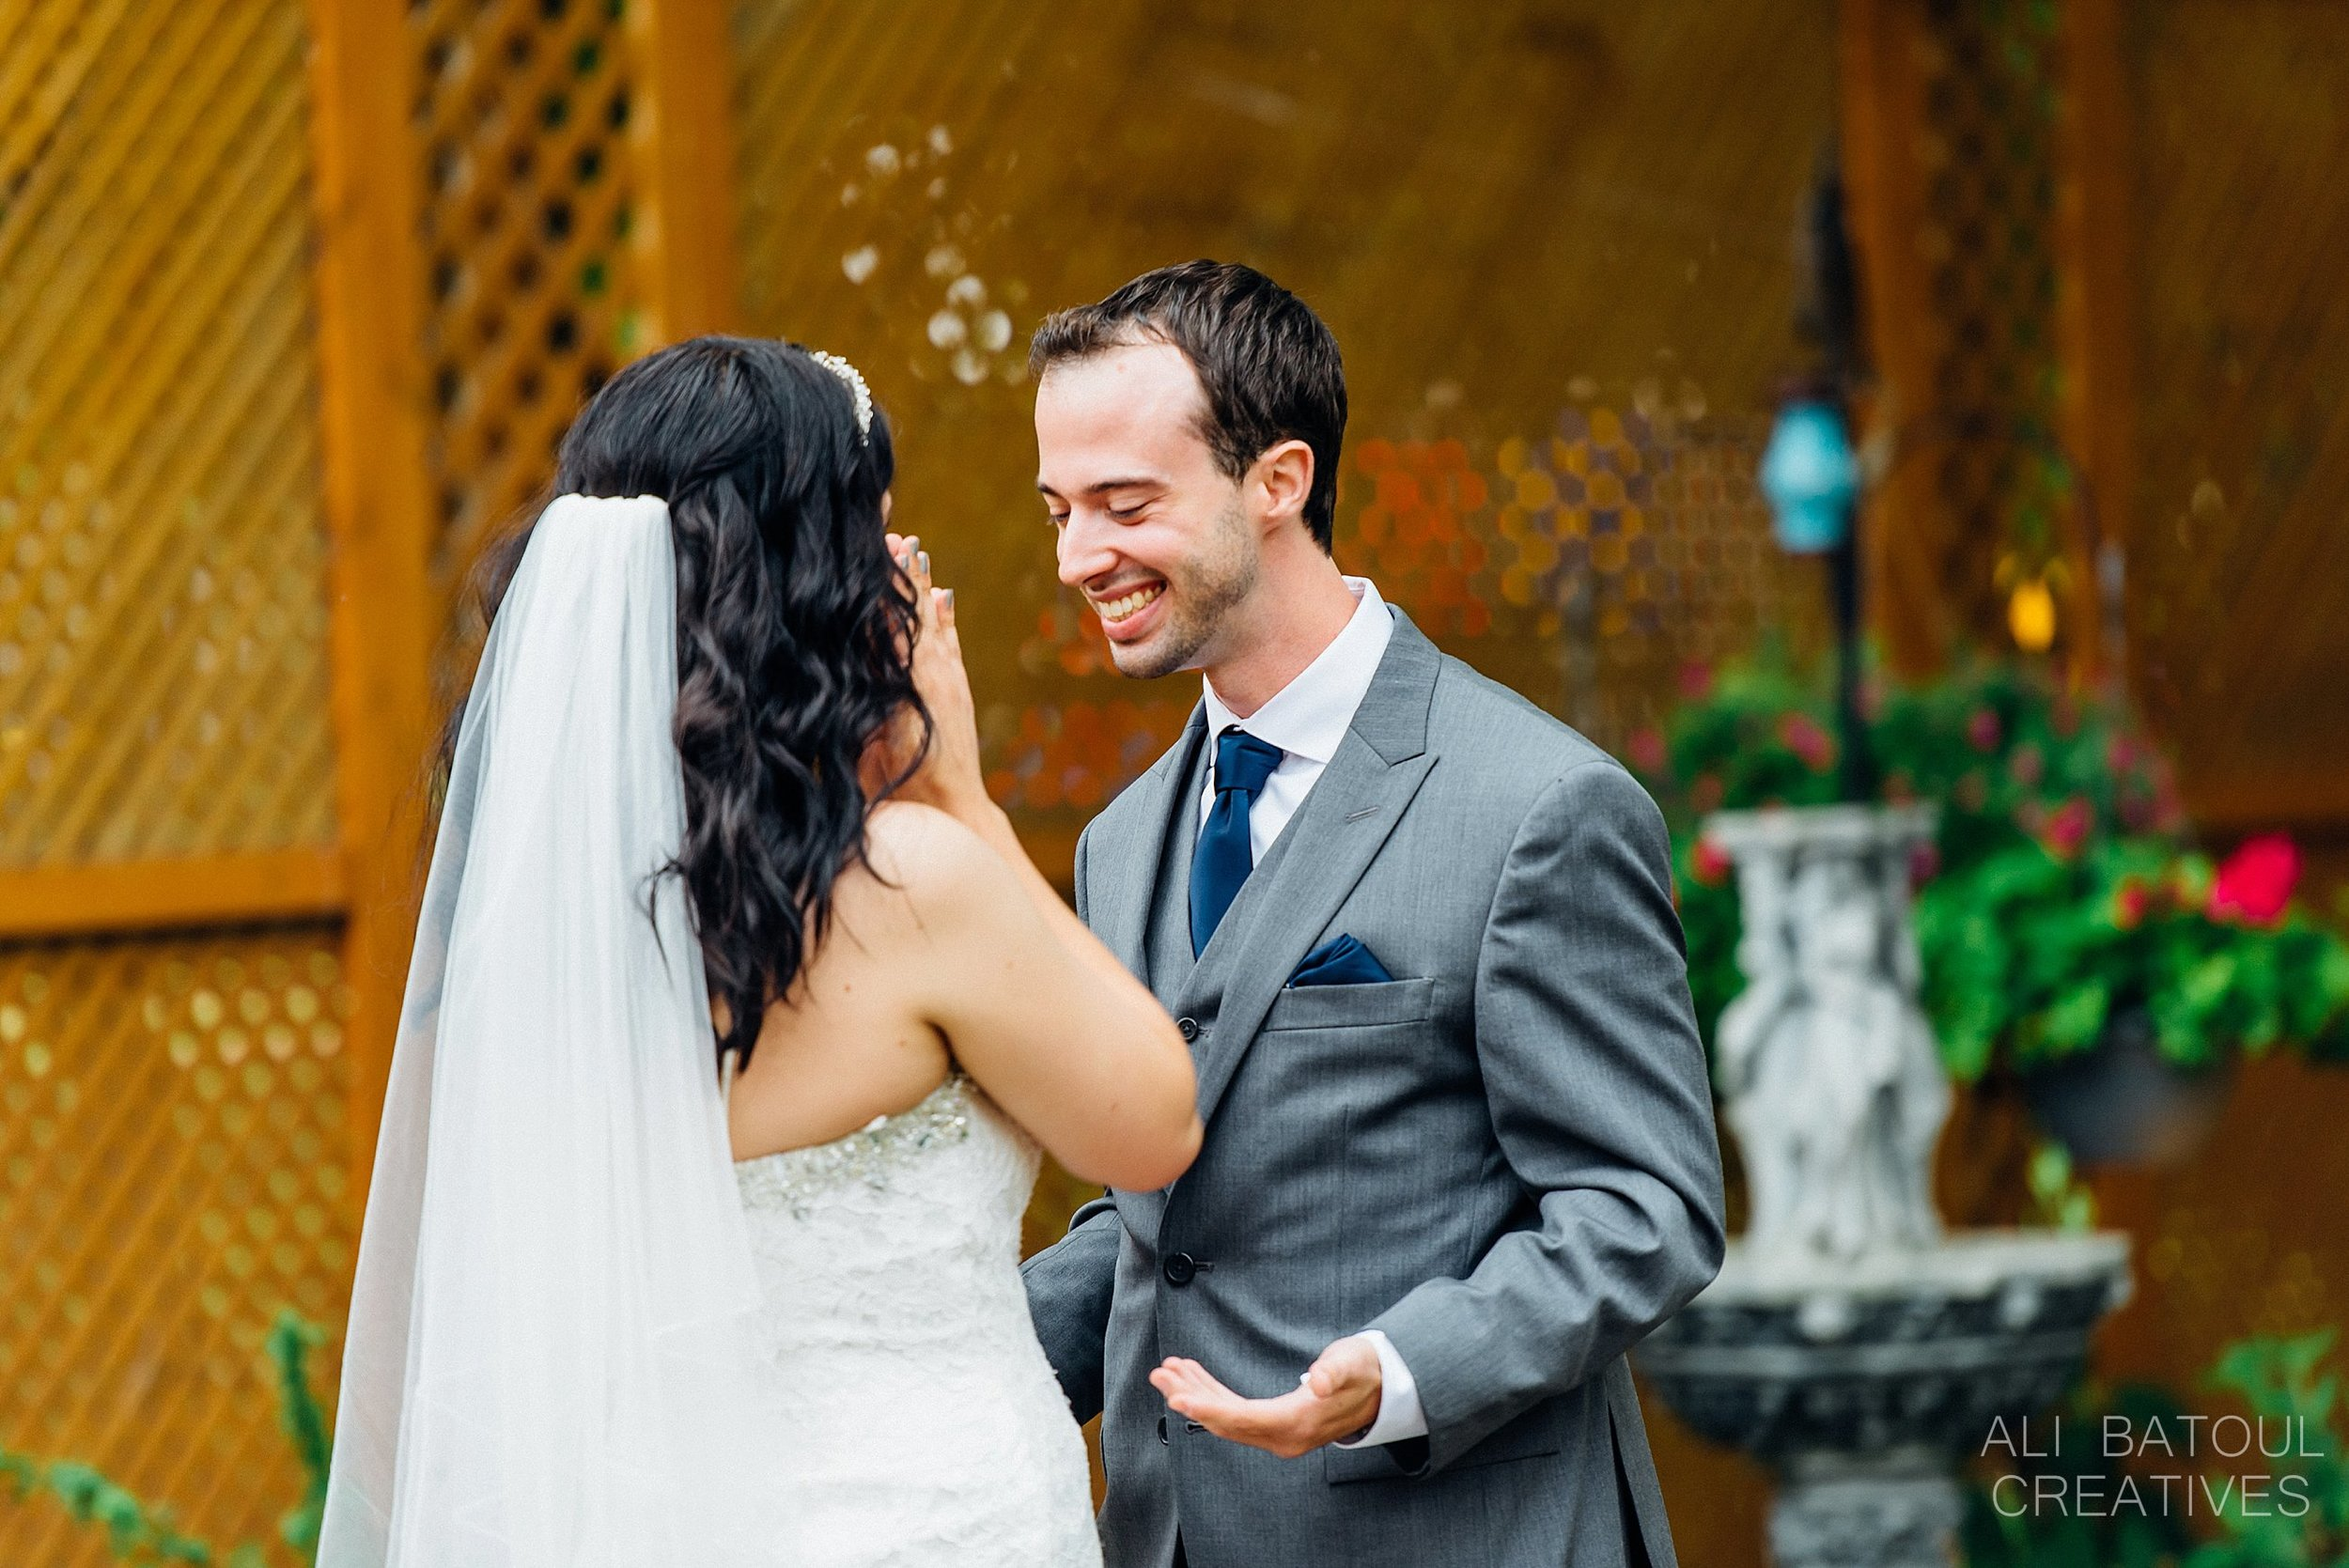 Jocelyn + Steve At The Schoolhouse Wedding - Ali and Batoul Fine Art Wedding Photography_0028.jpg